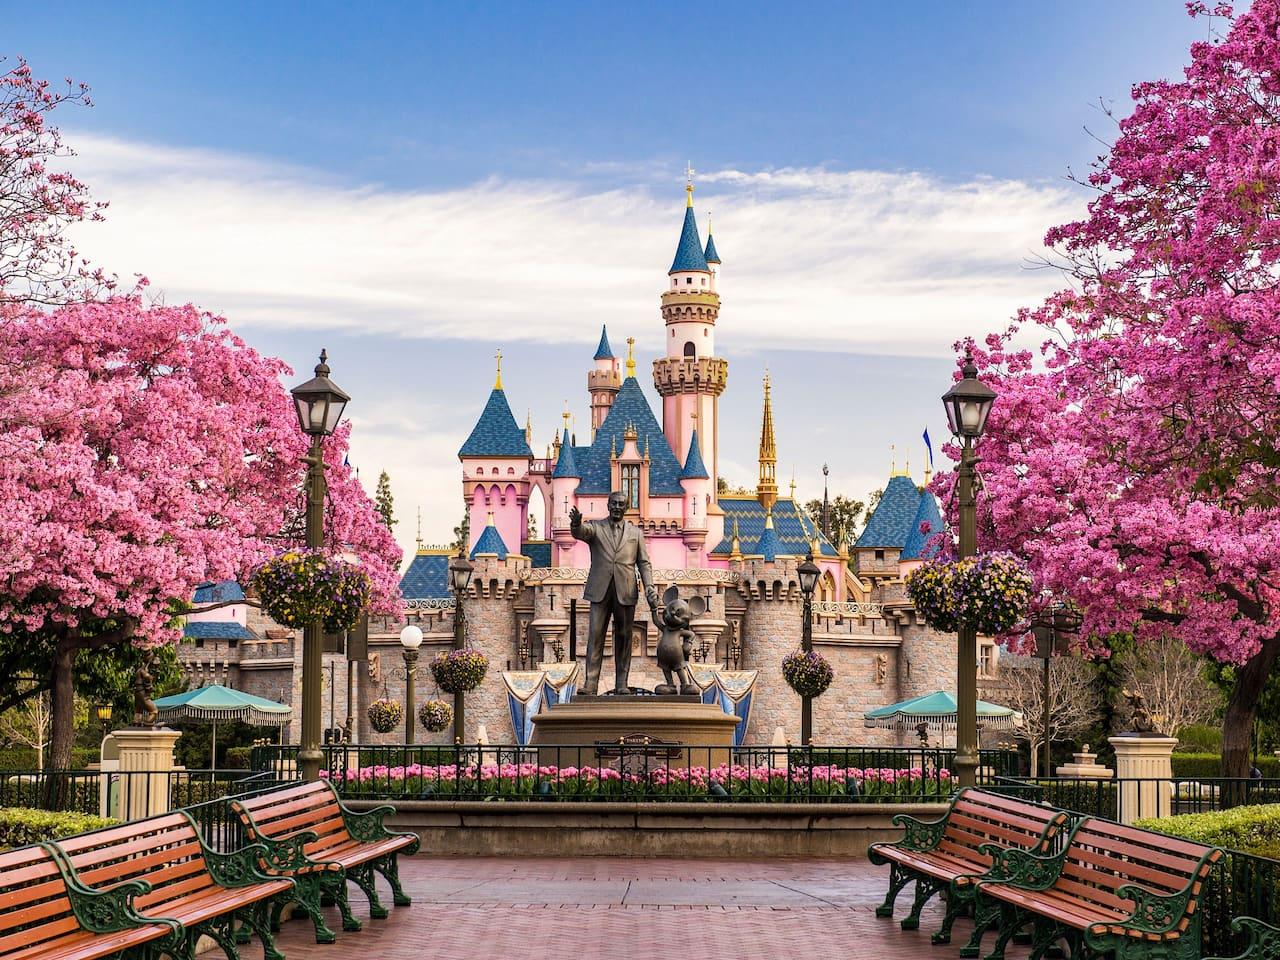 Disneys Paradise Pier